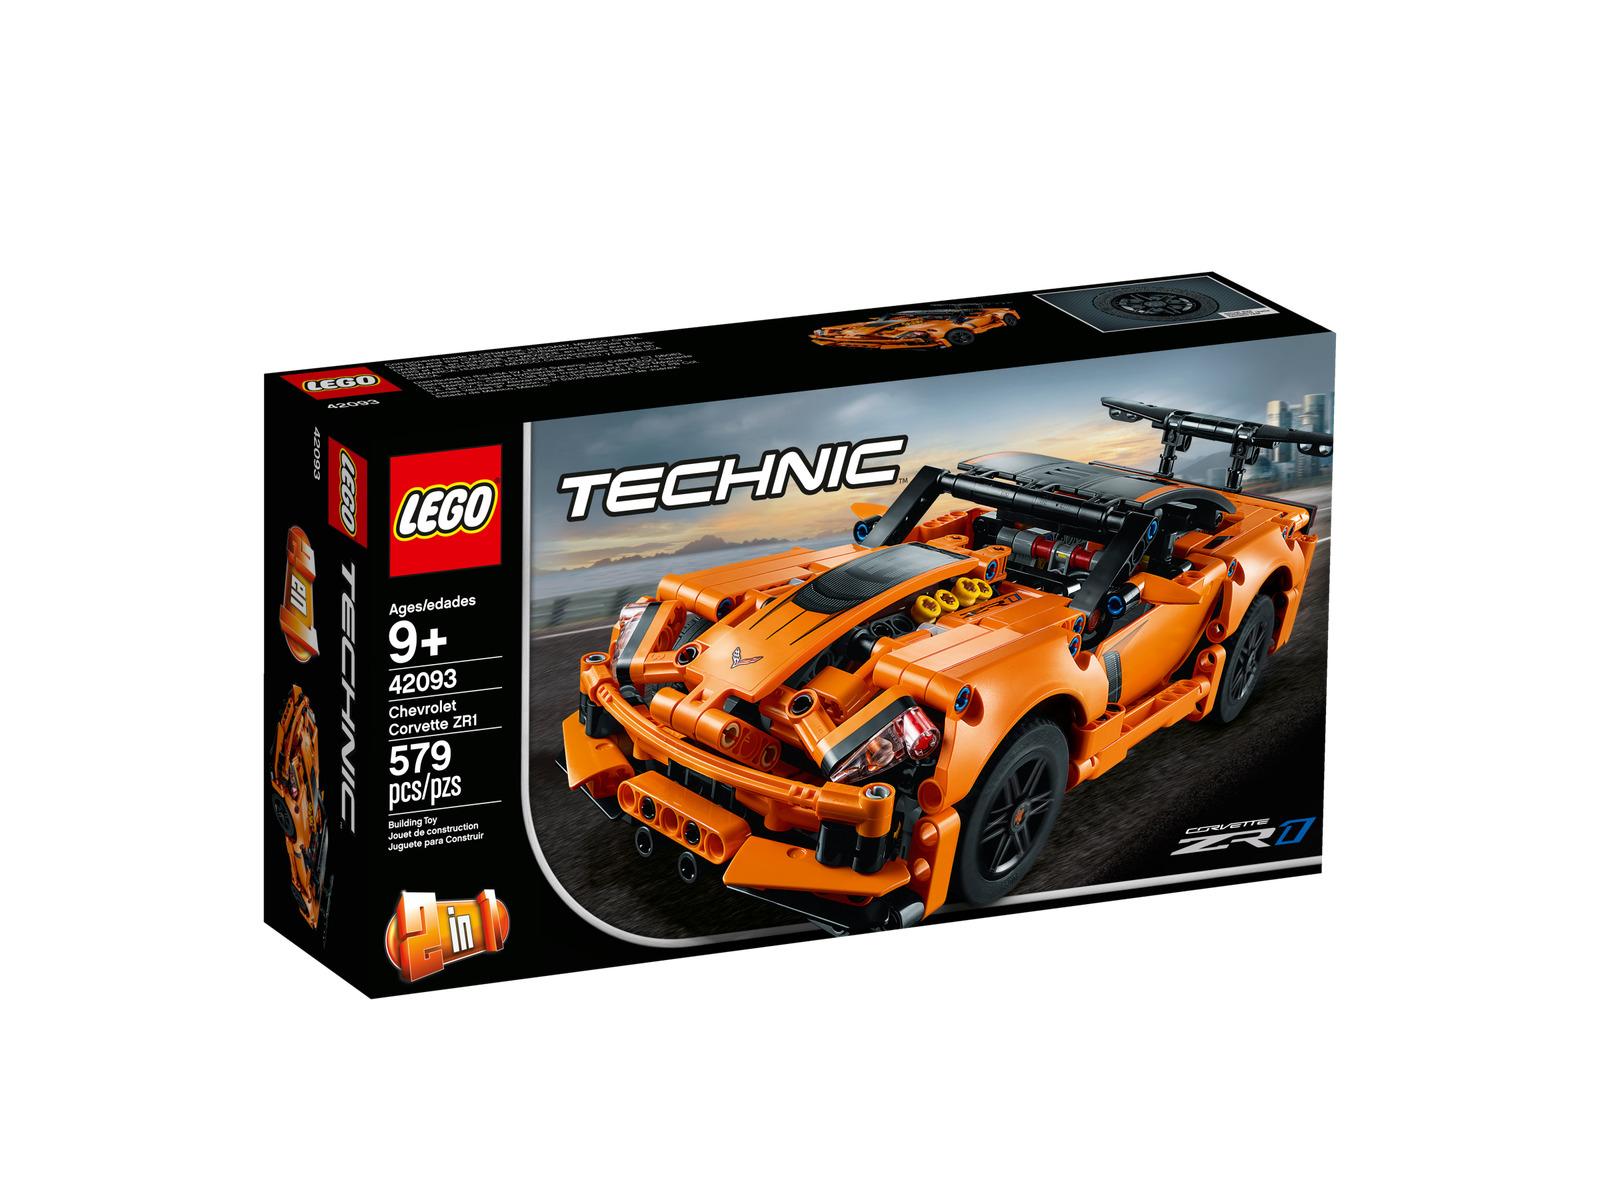 Lego Technic Chevrolet Corvette ZR1 (42093) NEU   OVP